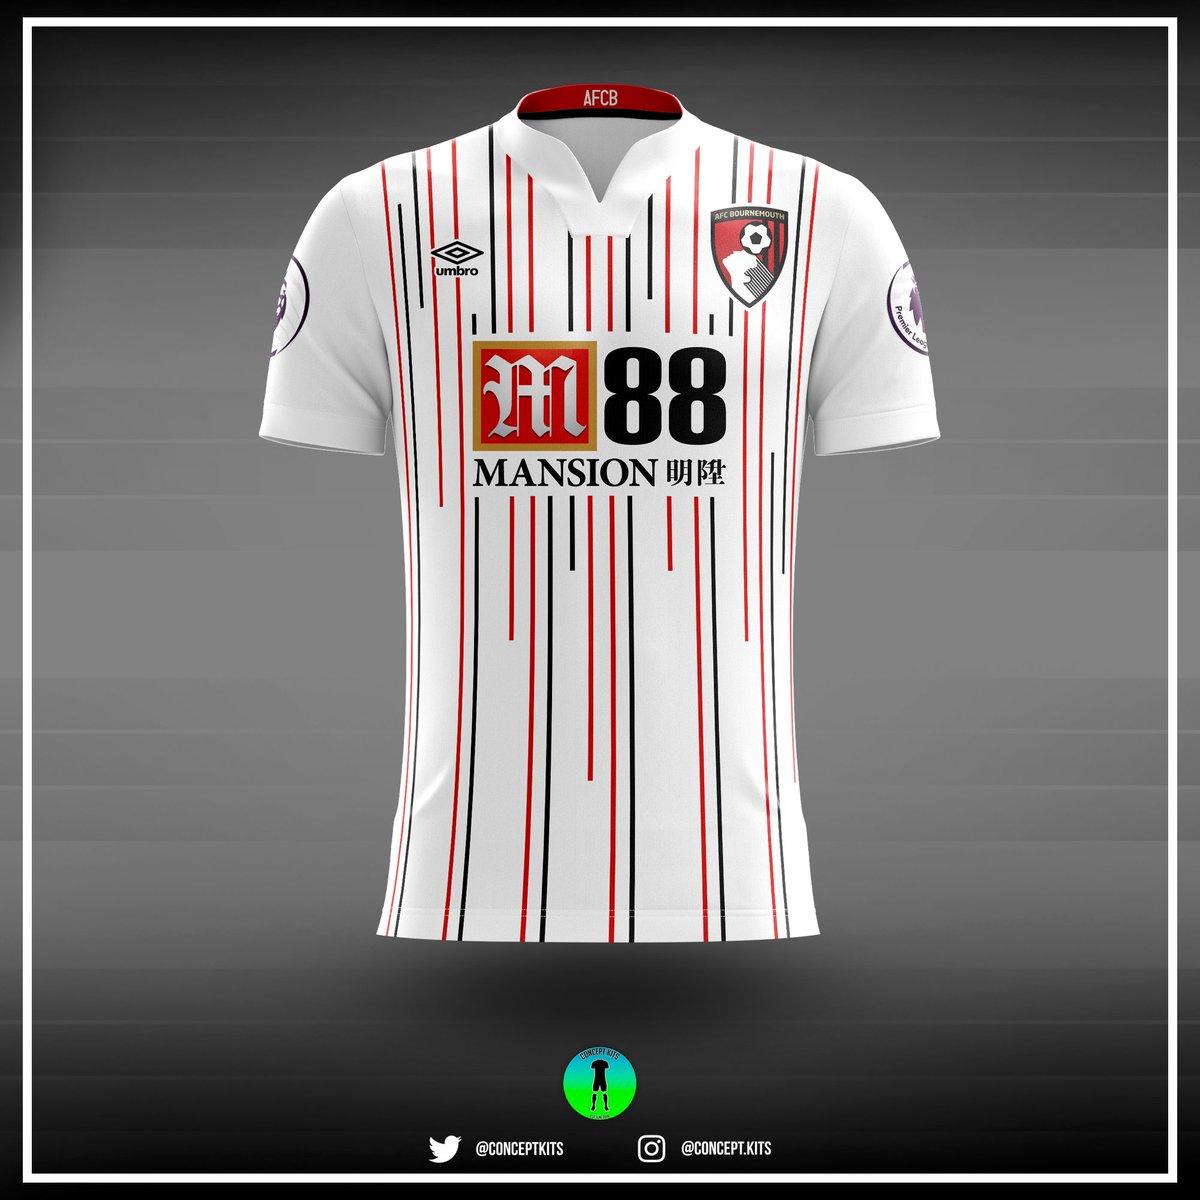 AFC Bournemouth third kit concept 2017/18 #AFCB #Cherries #Bournemouth #DeanCourt #umbro #premierleague #PL #EddieHowe #AFCBournemouth<br>http://pic.twitter.com/bq33aB4LKX